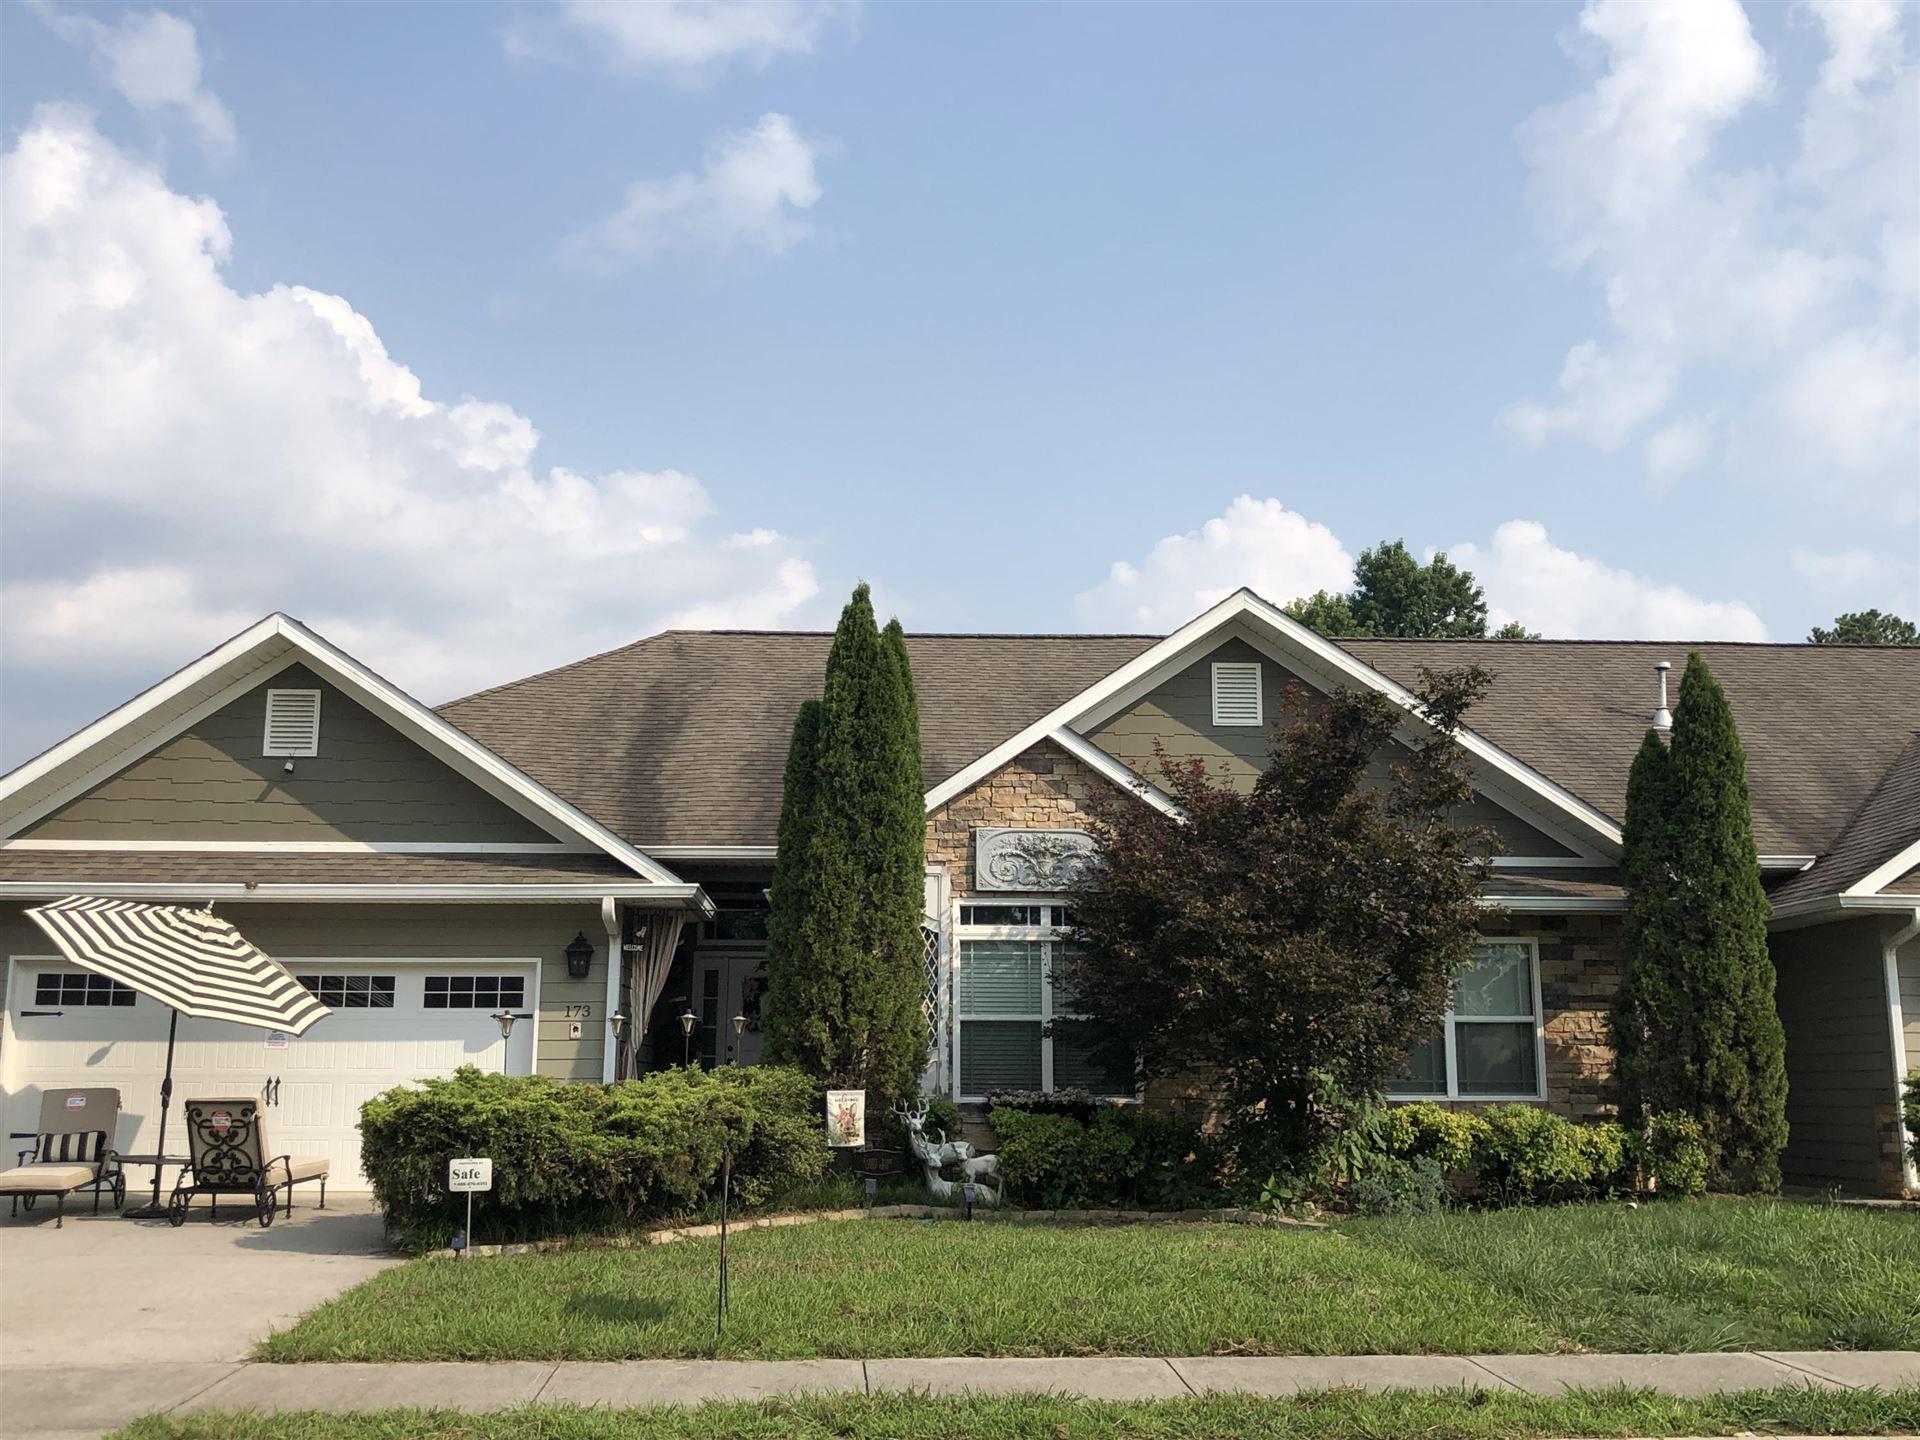 Photo of 173 Crossroads Blvd, Oak Ridge, TN 37830 (MLS # 1161138)